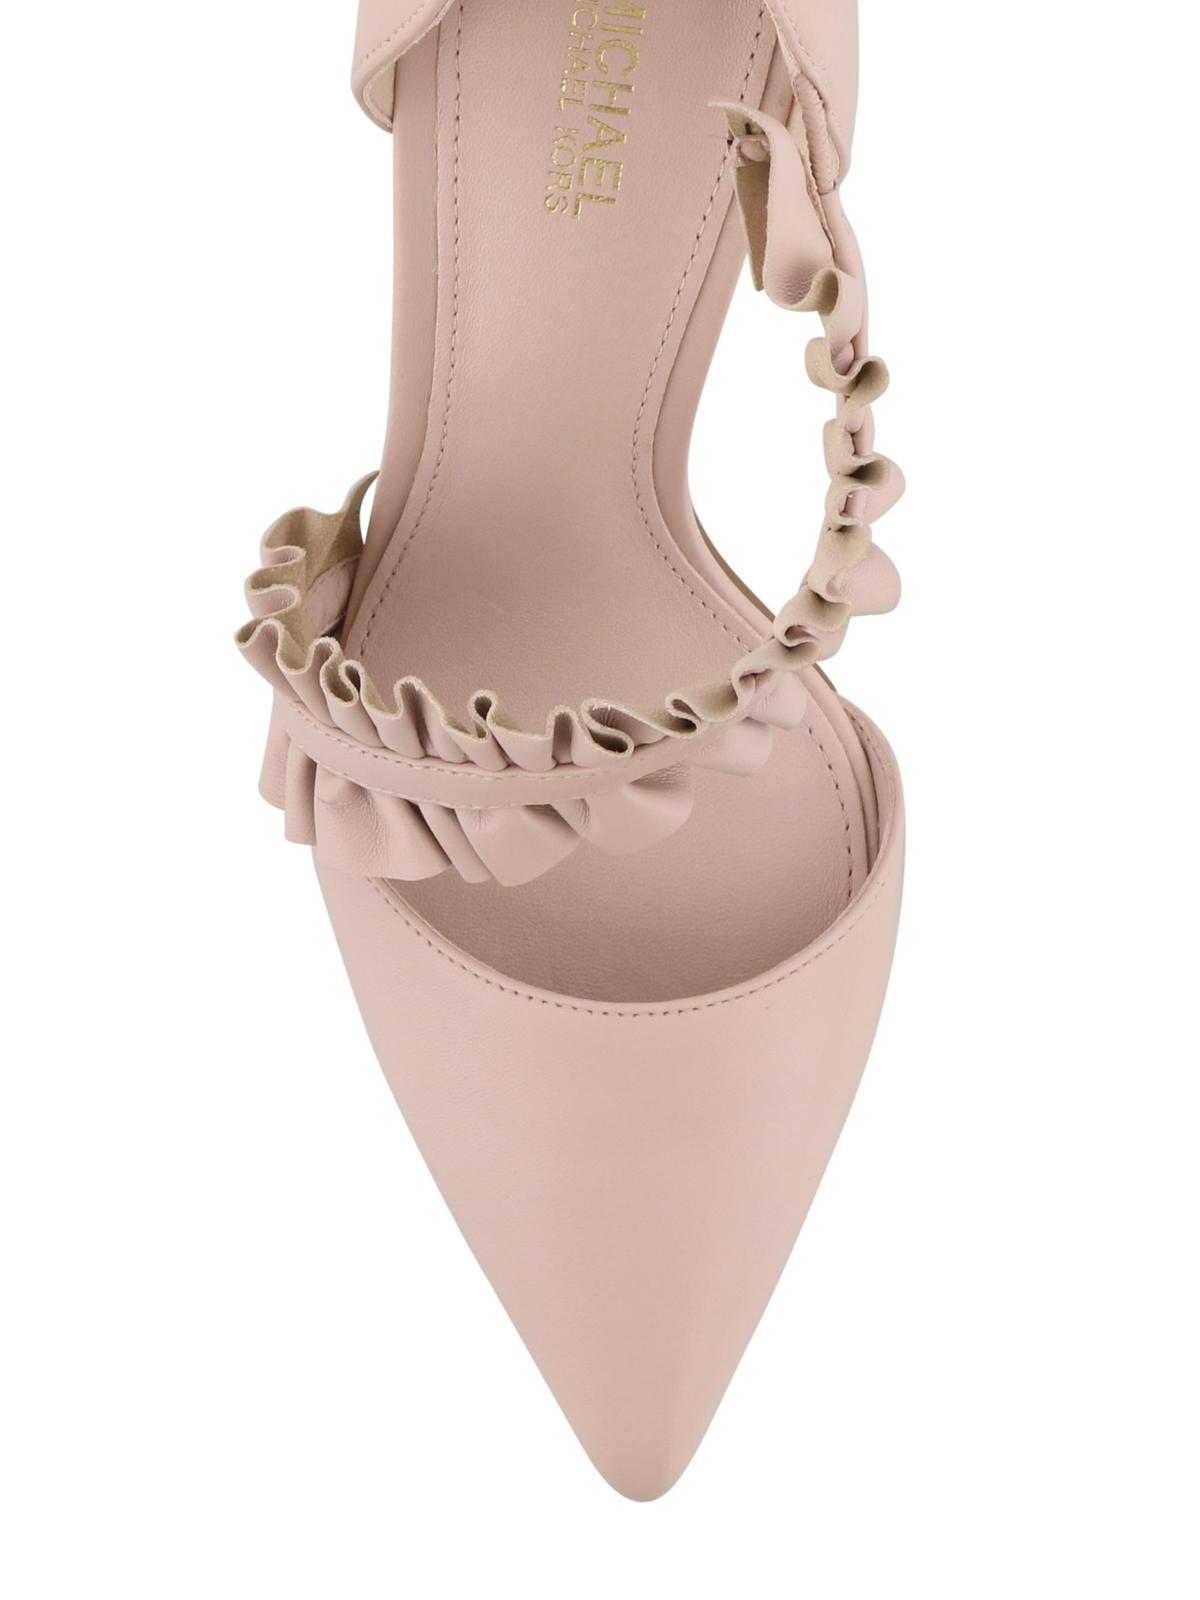 Michael Kors - Bella pink pointy pumps